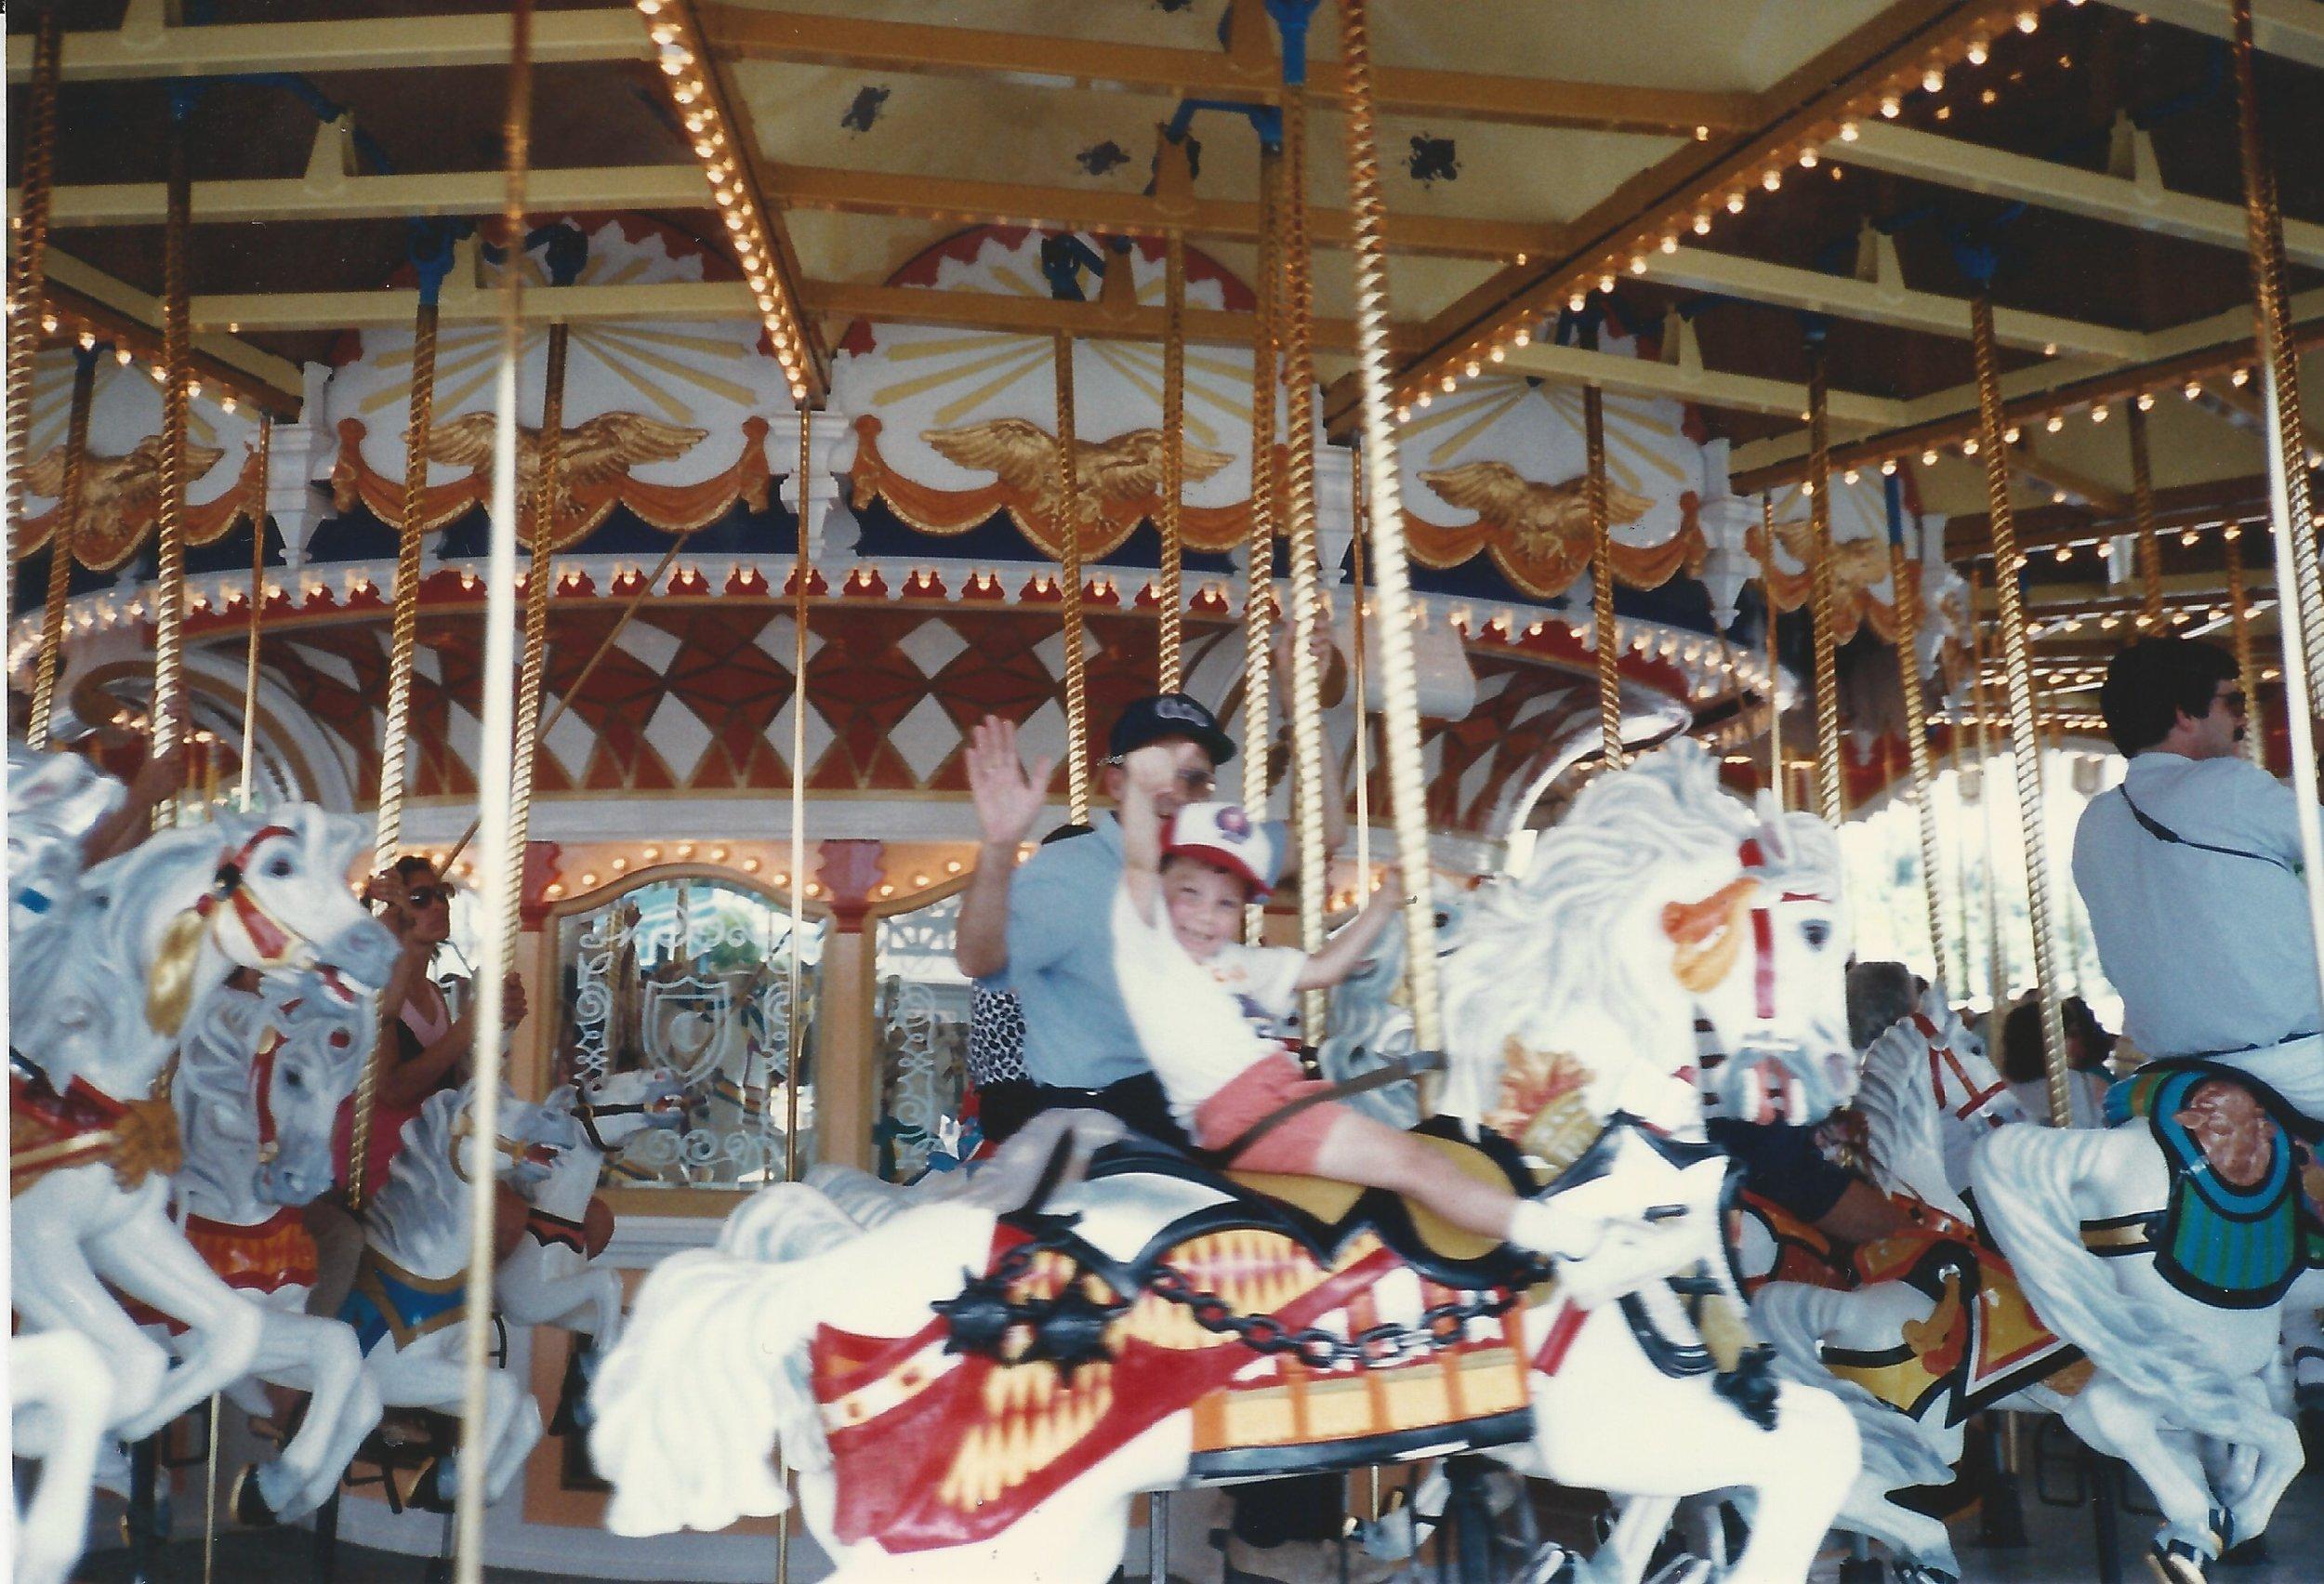 kev on carousel.jpg